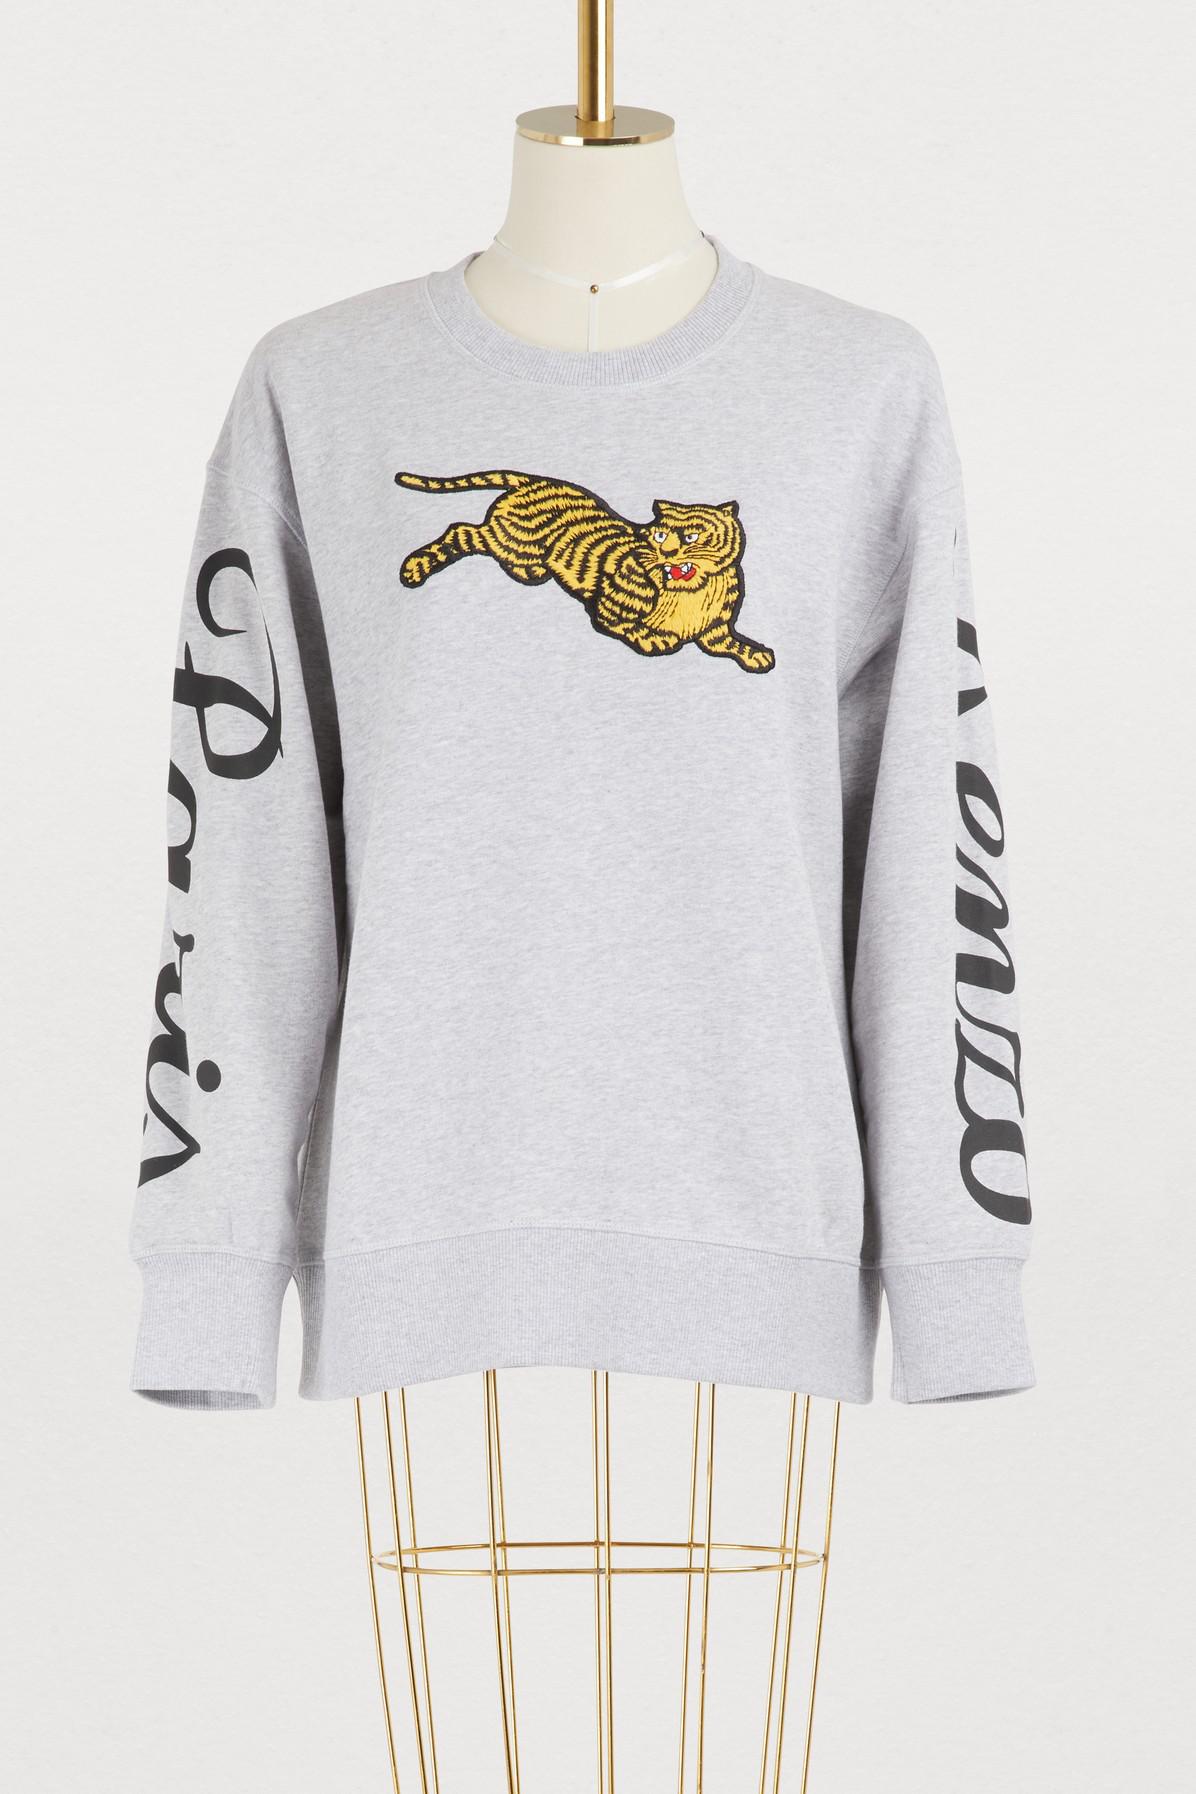 020c3896 Kenzo Cotton Jumping Tiger Sweatshirt In Pearl Grey   ModeSens